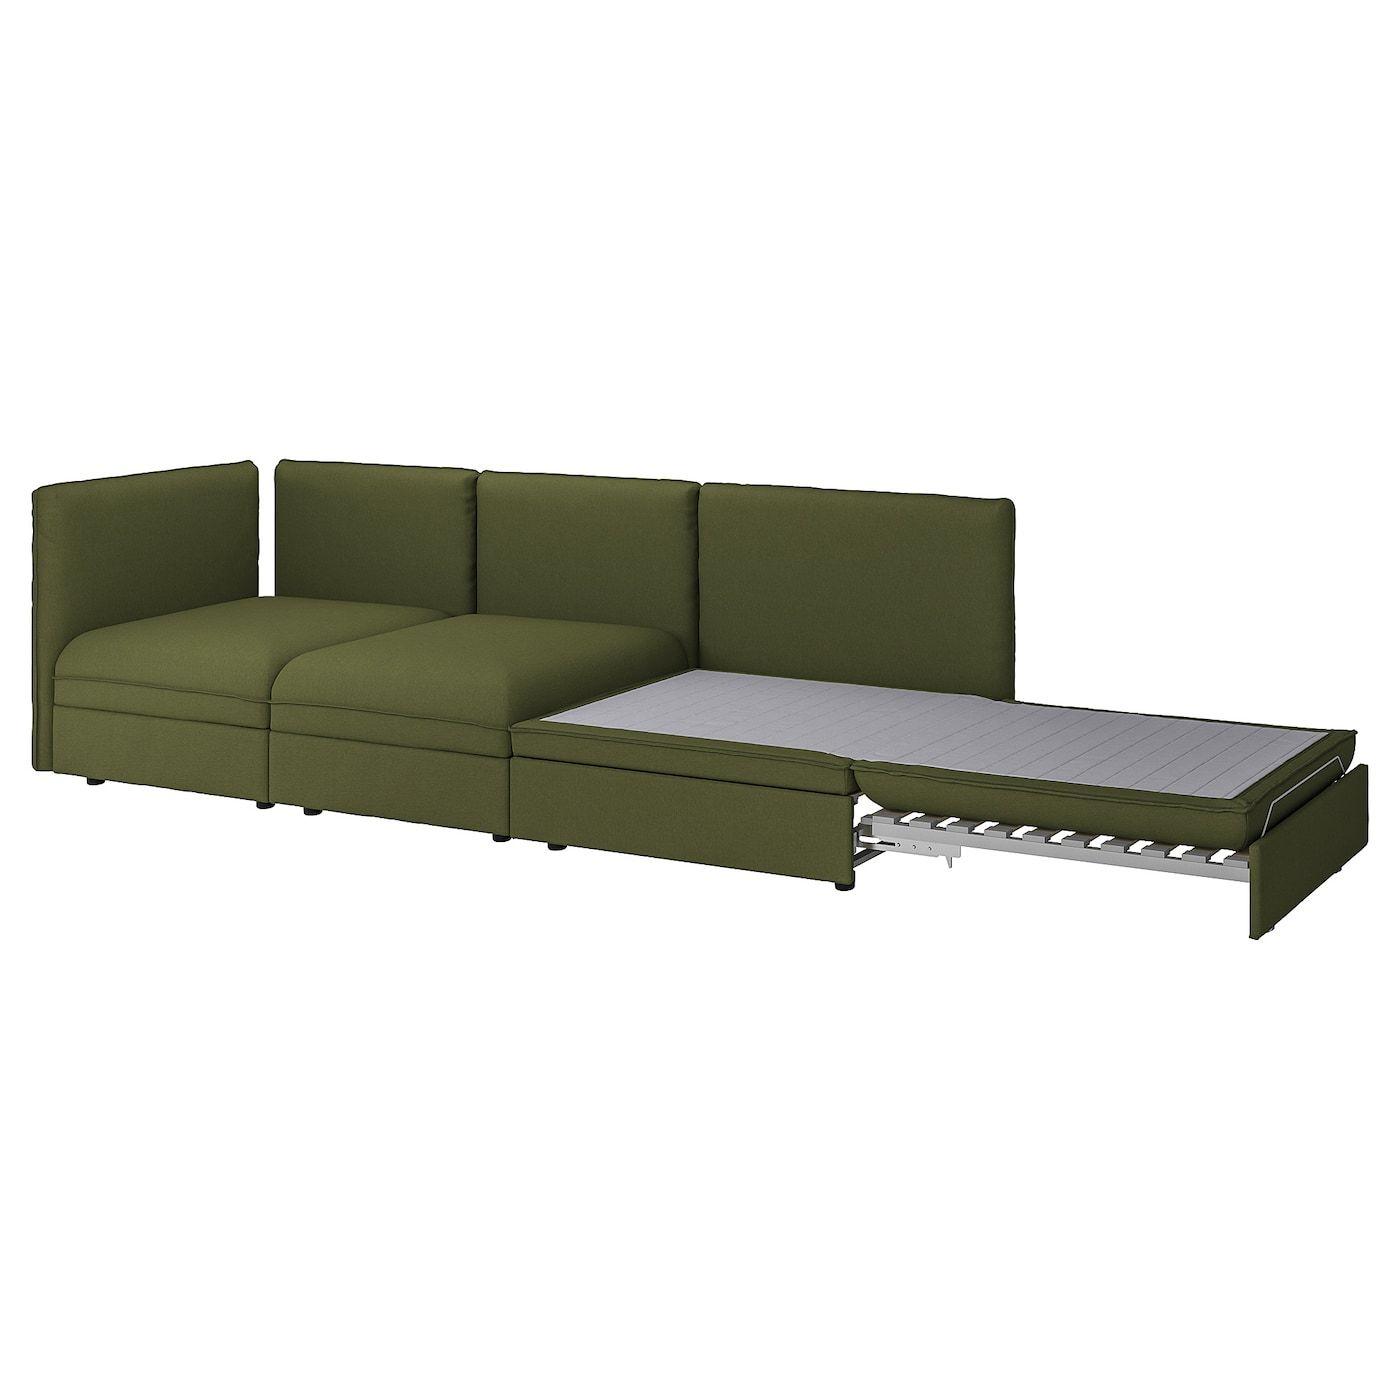 Vallentuna 3er Sitzelement Mit Bettsofa Ohne Abschluss Orrsta Sleeper Sofa Ikea Sectional Sofa Sofa